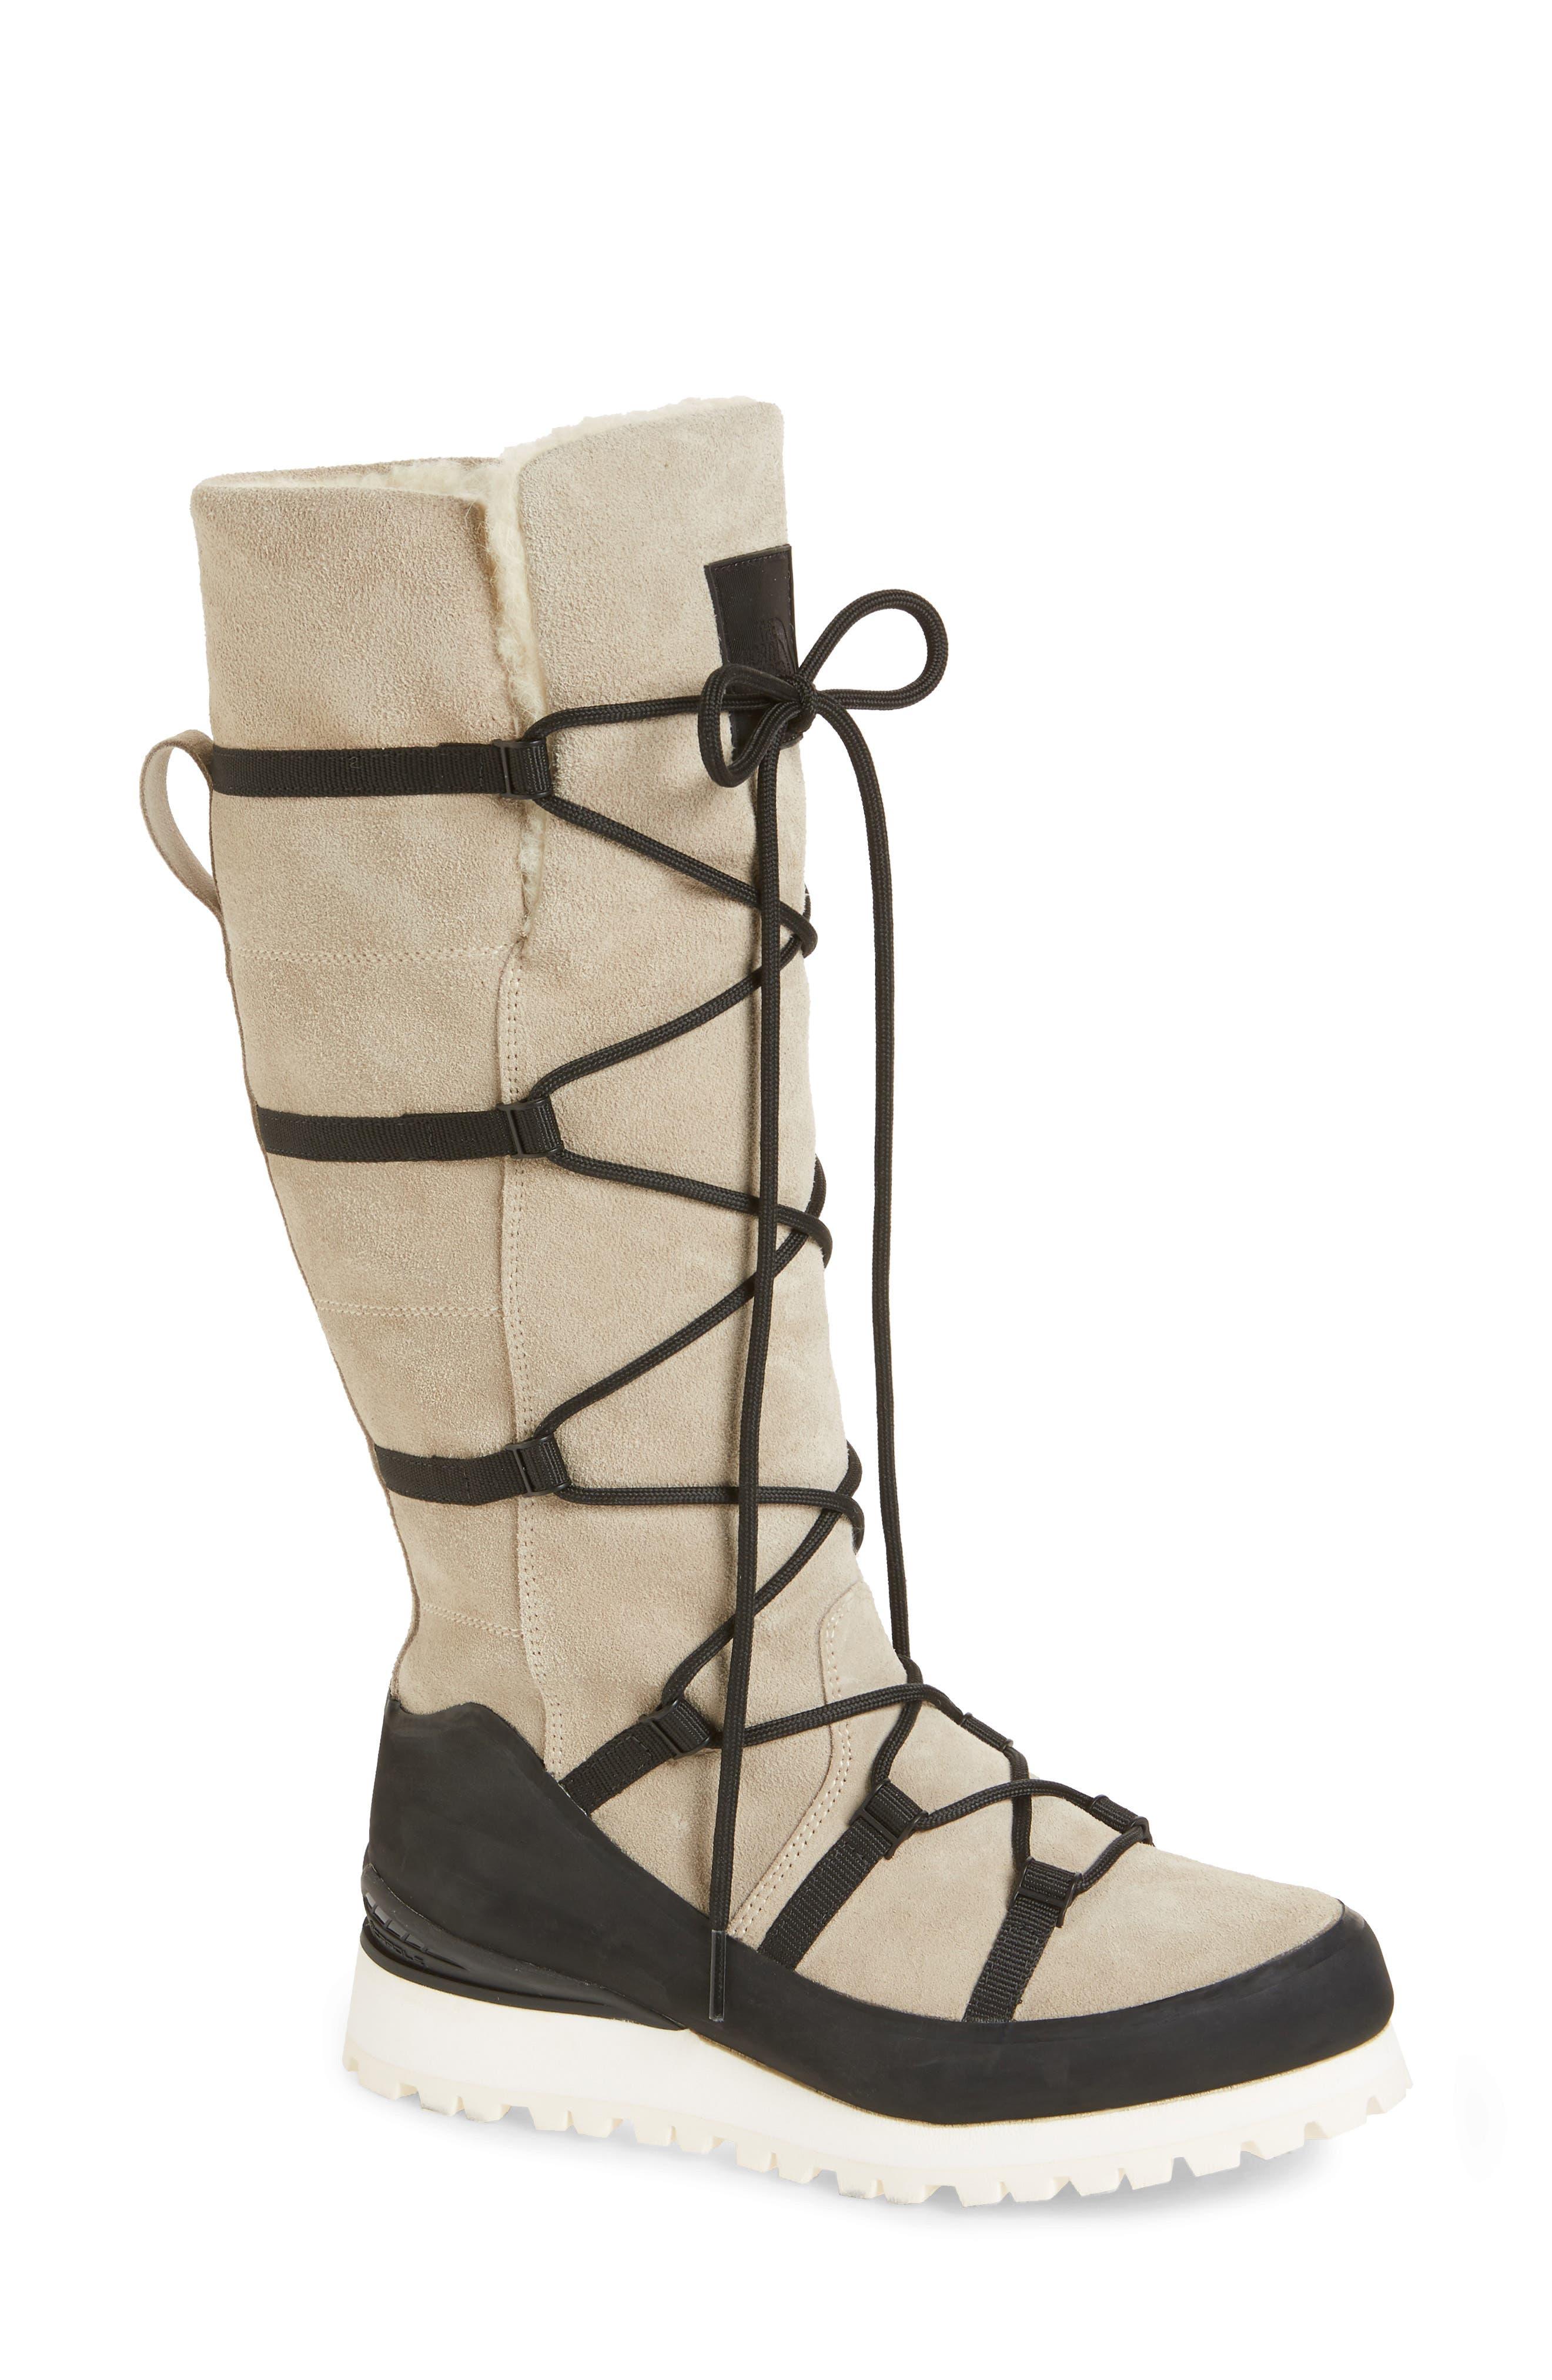 The North Face Cryos Knee High Waterproof Boot, Grey